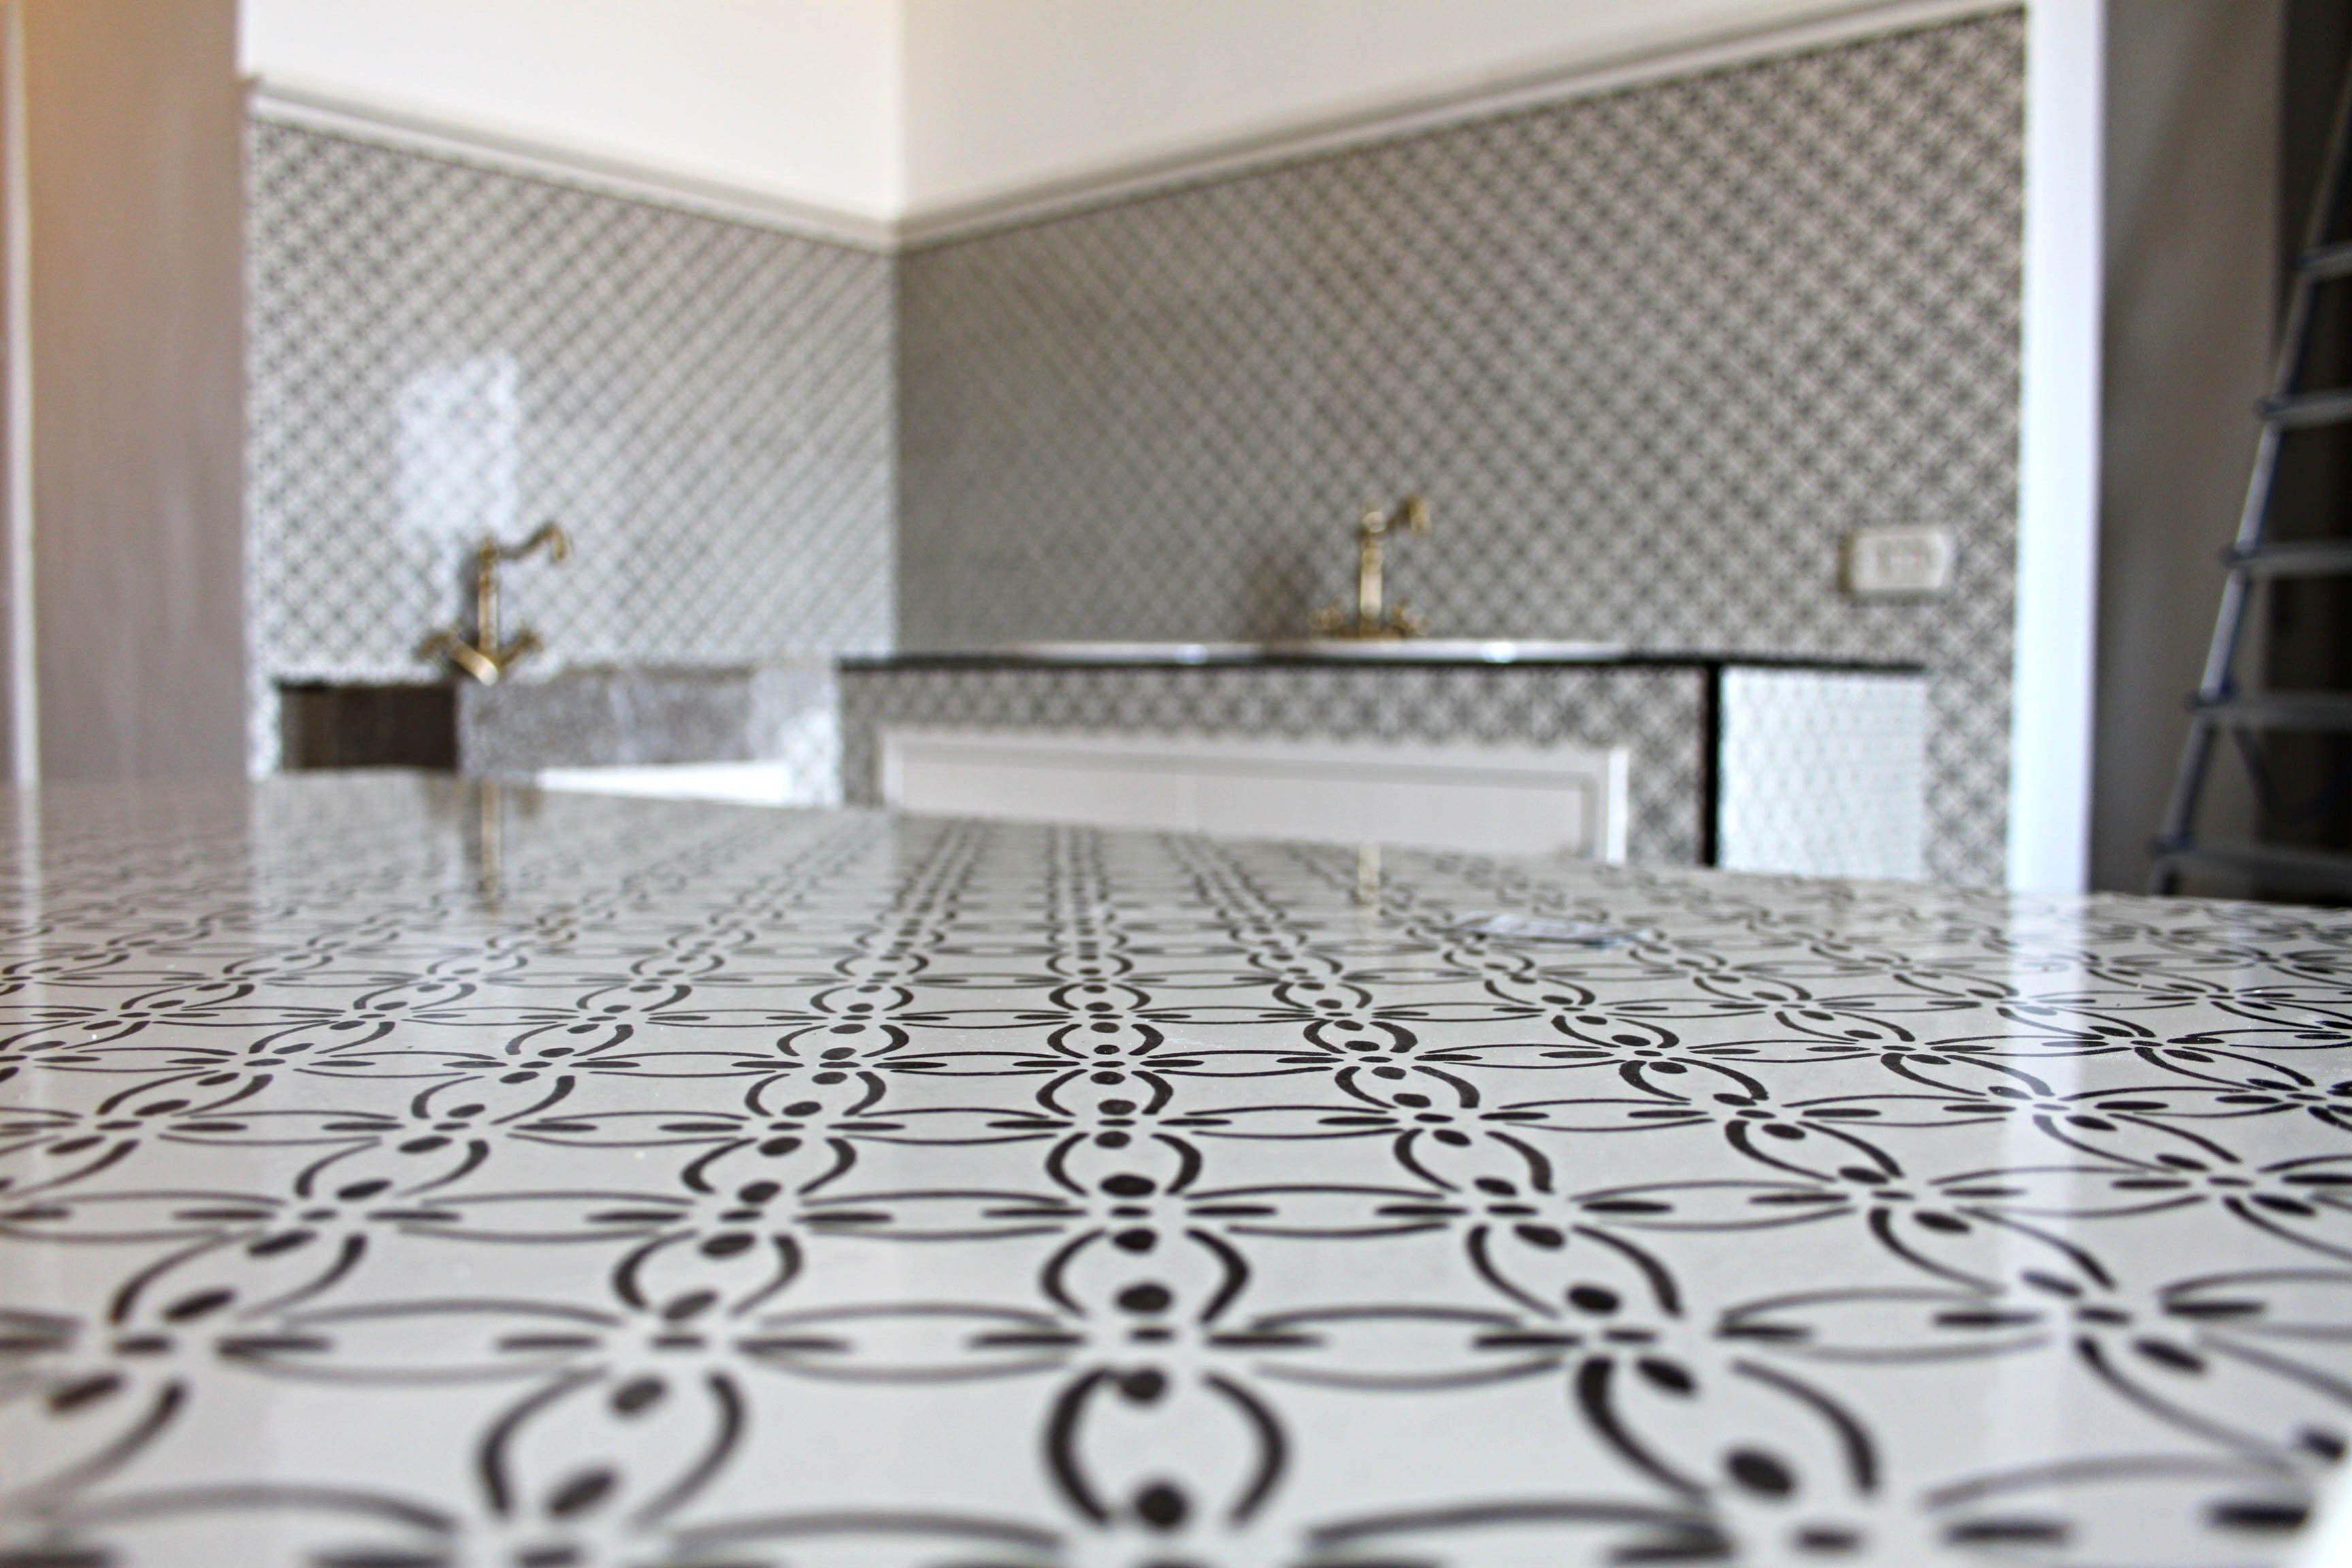 Top cucina in pietra lavica by sgarlata emanuele c - Top cucina pietra lavica ...